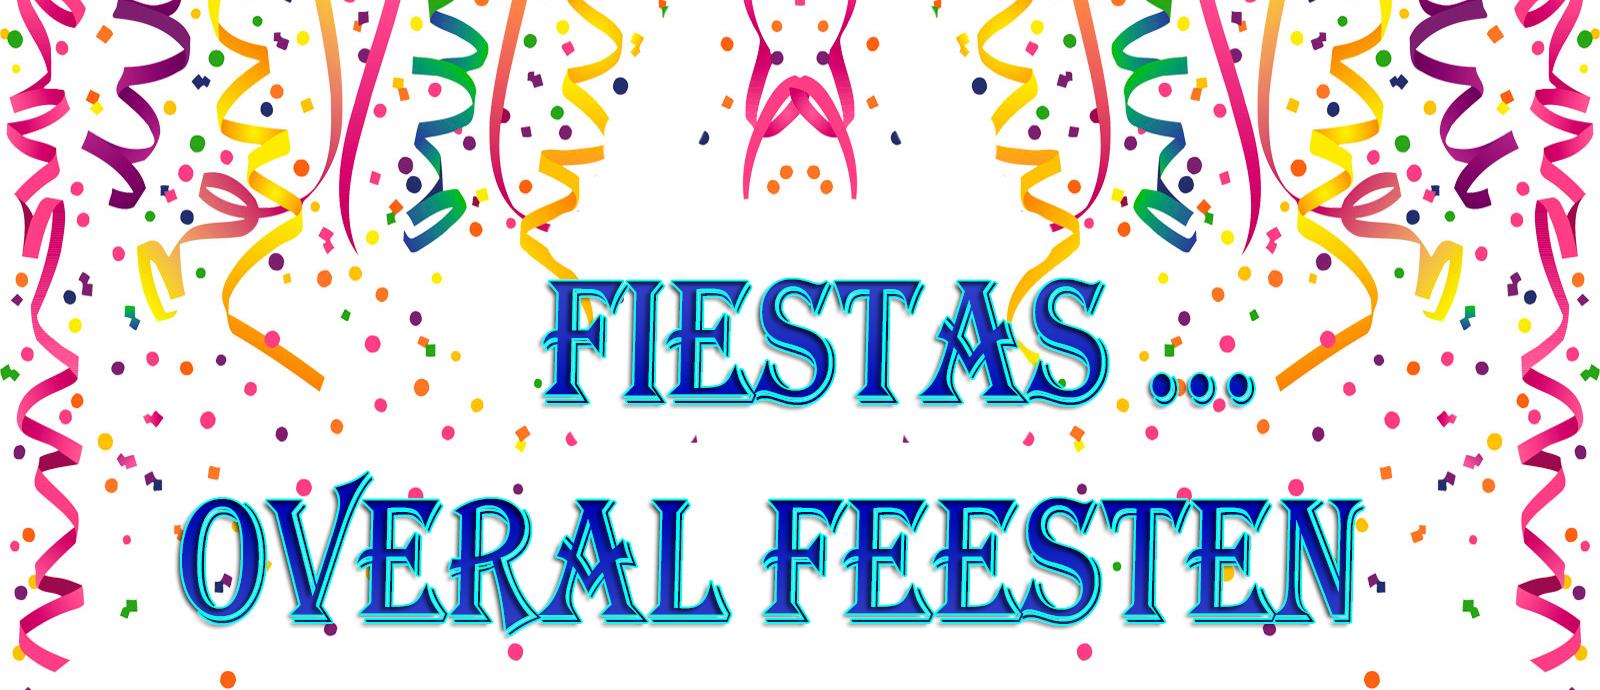 Tenerife-Connect feest fiesta amusement traditie cultuur